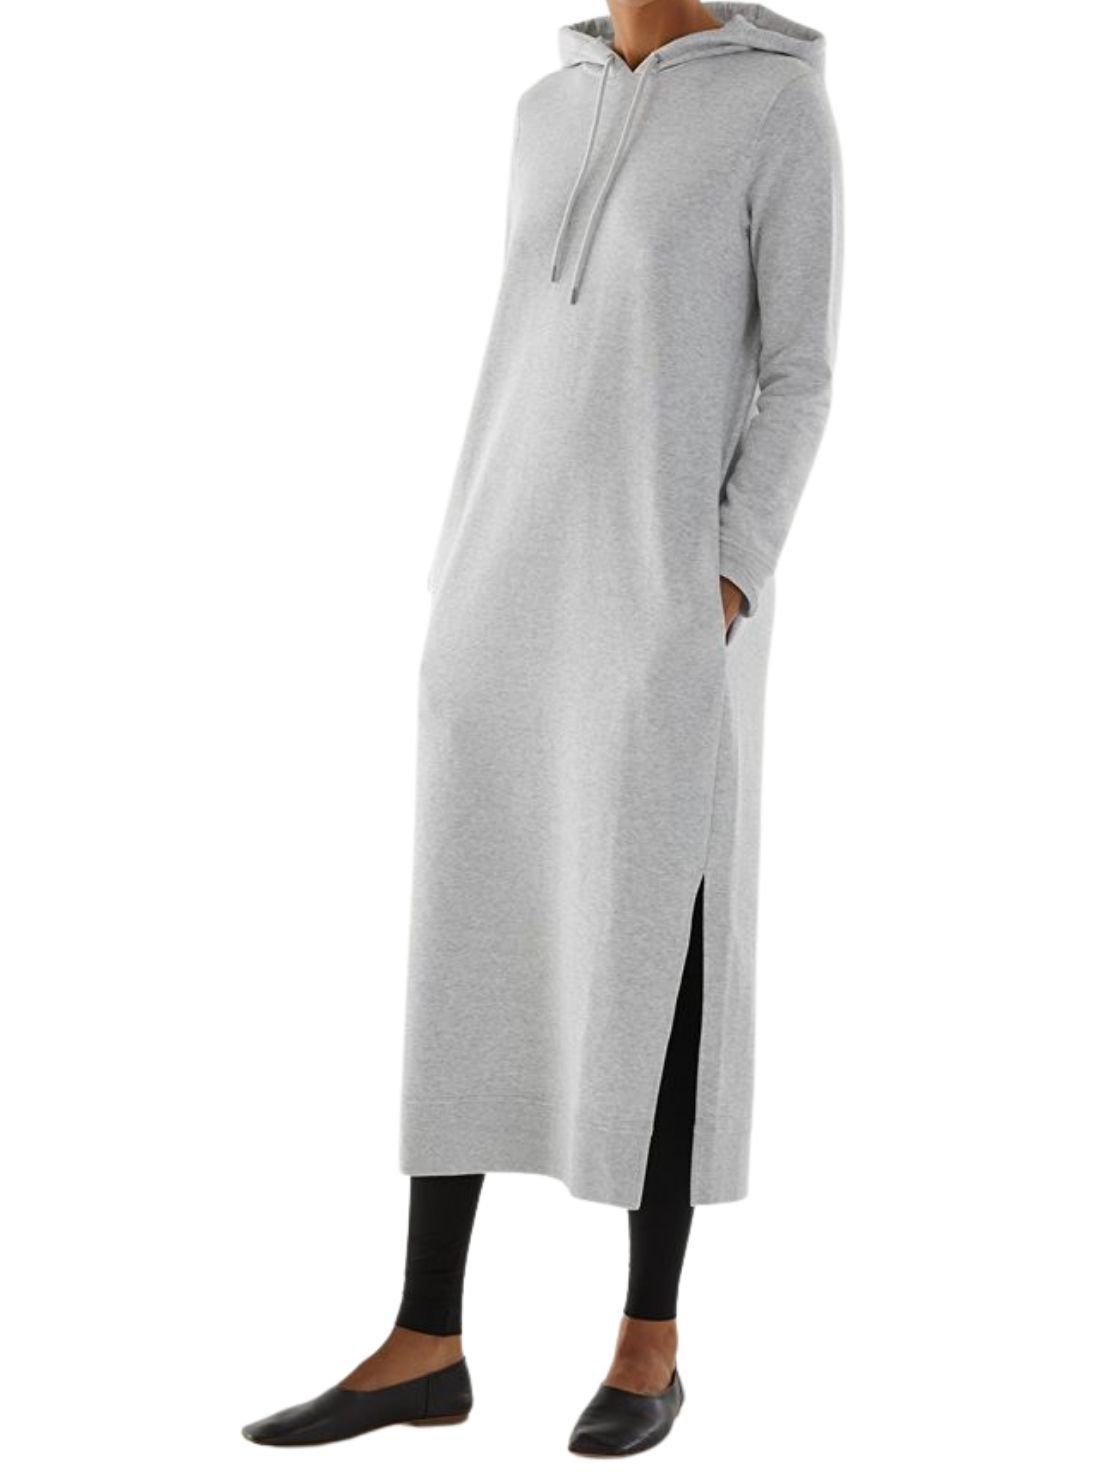 Long Hoodie Wholesale Sweater Dress